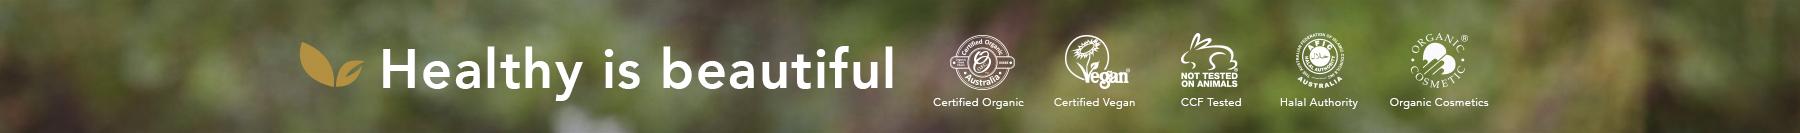 inika-website-healthy-is-beautiful-banner